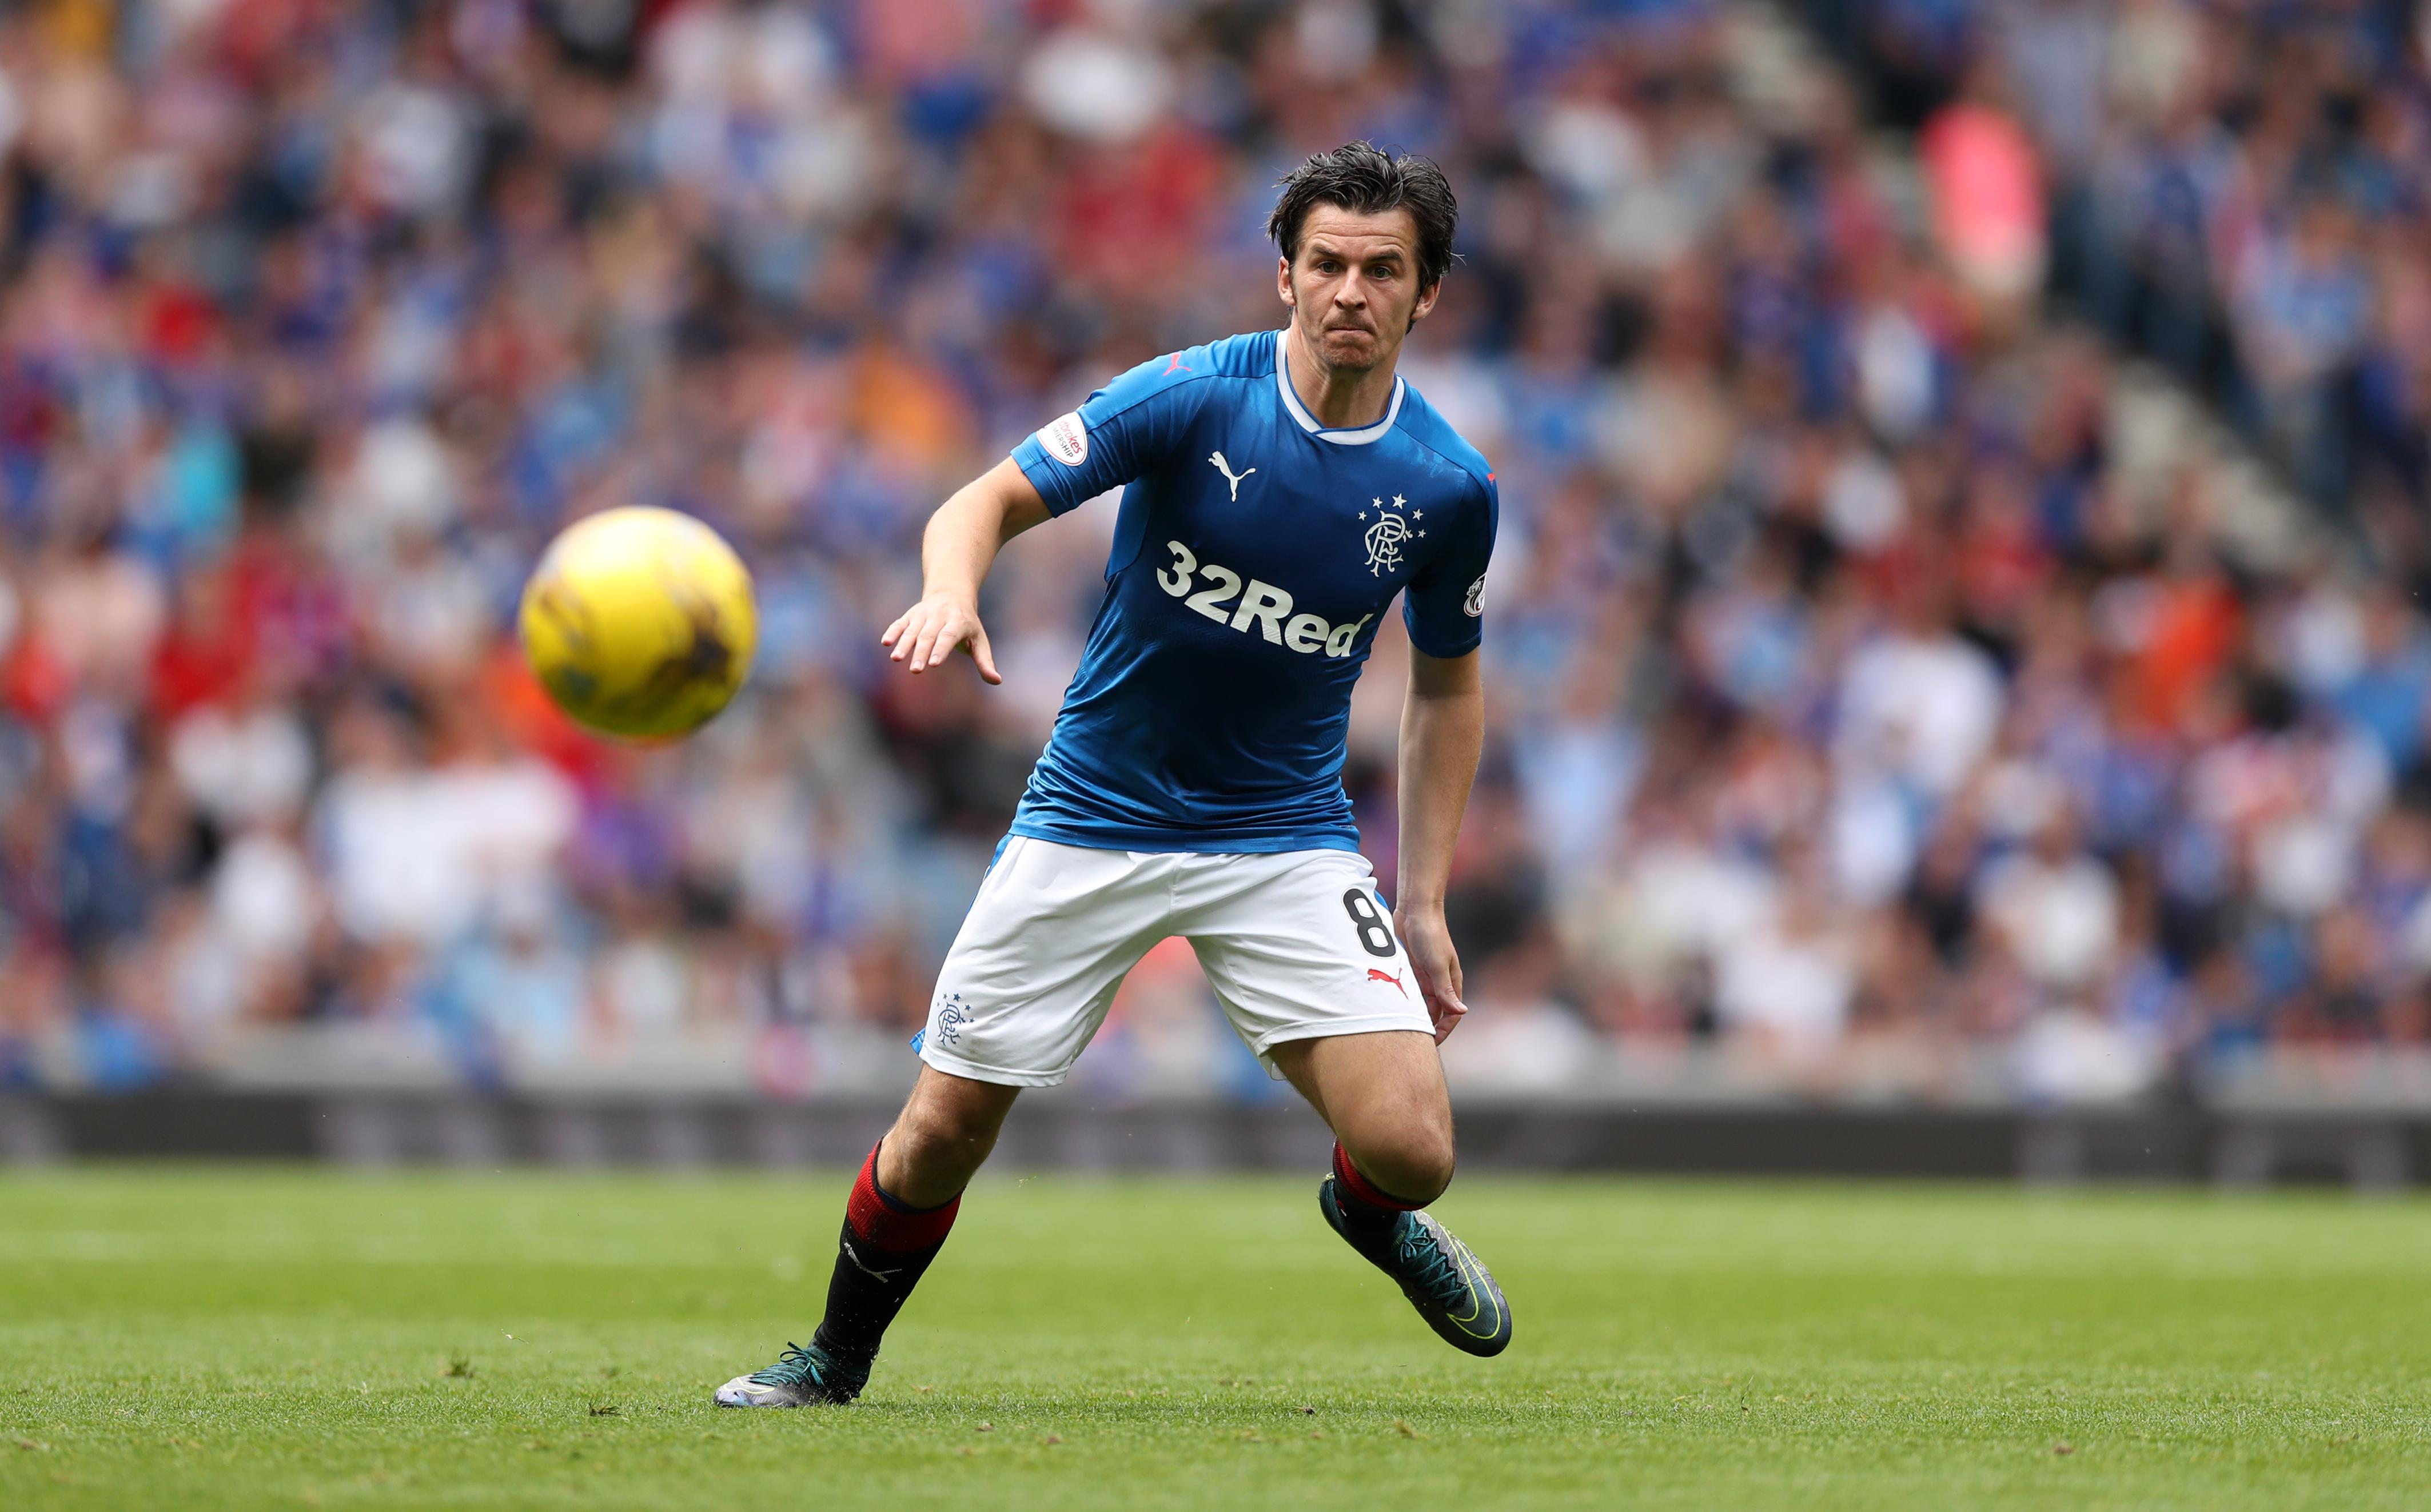 Joey Barton is back training with former club Burnley, Sean Dyche confirms